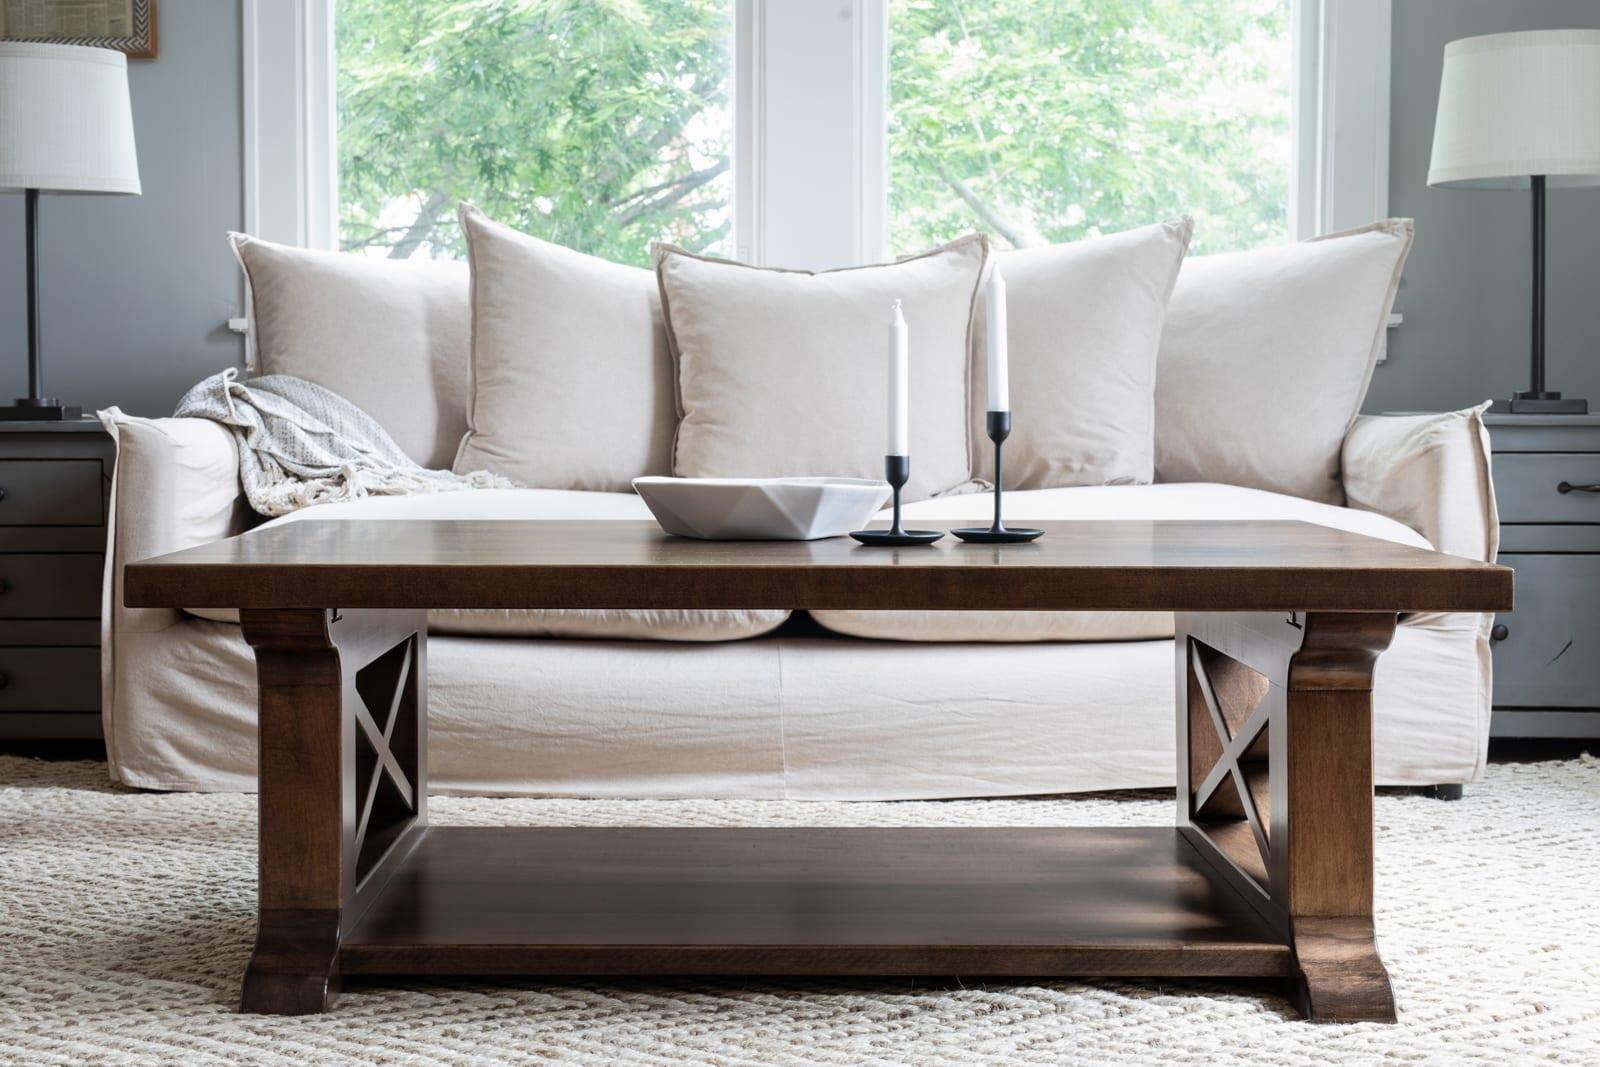 farmhouse coffee table  oldfarm rustic style living room